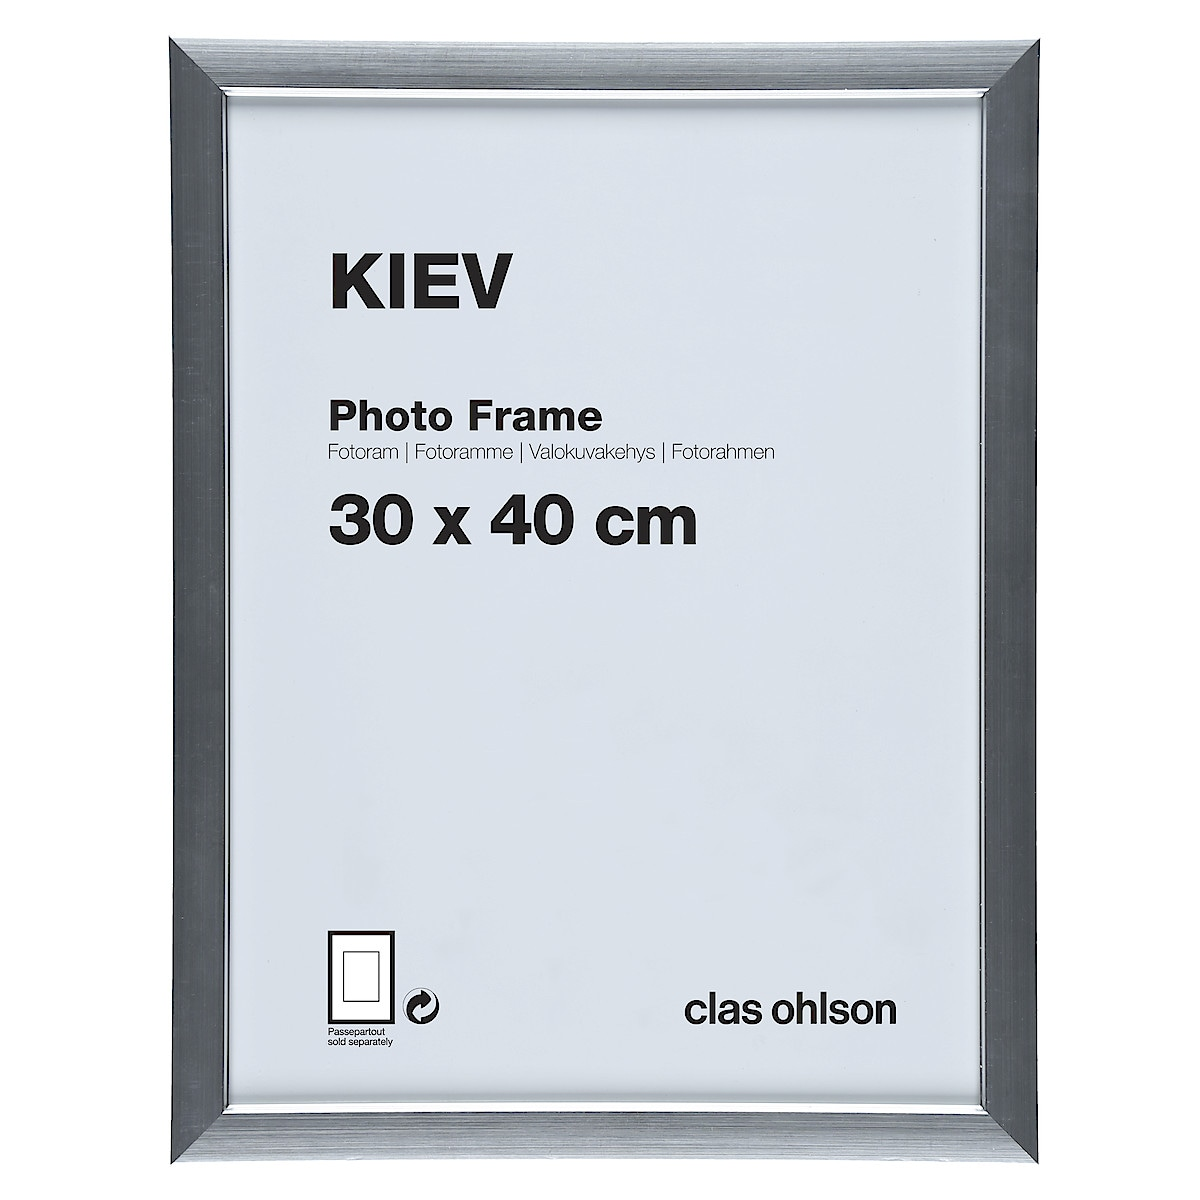 Fotoram Kiev